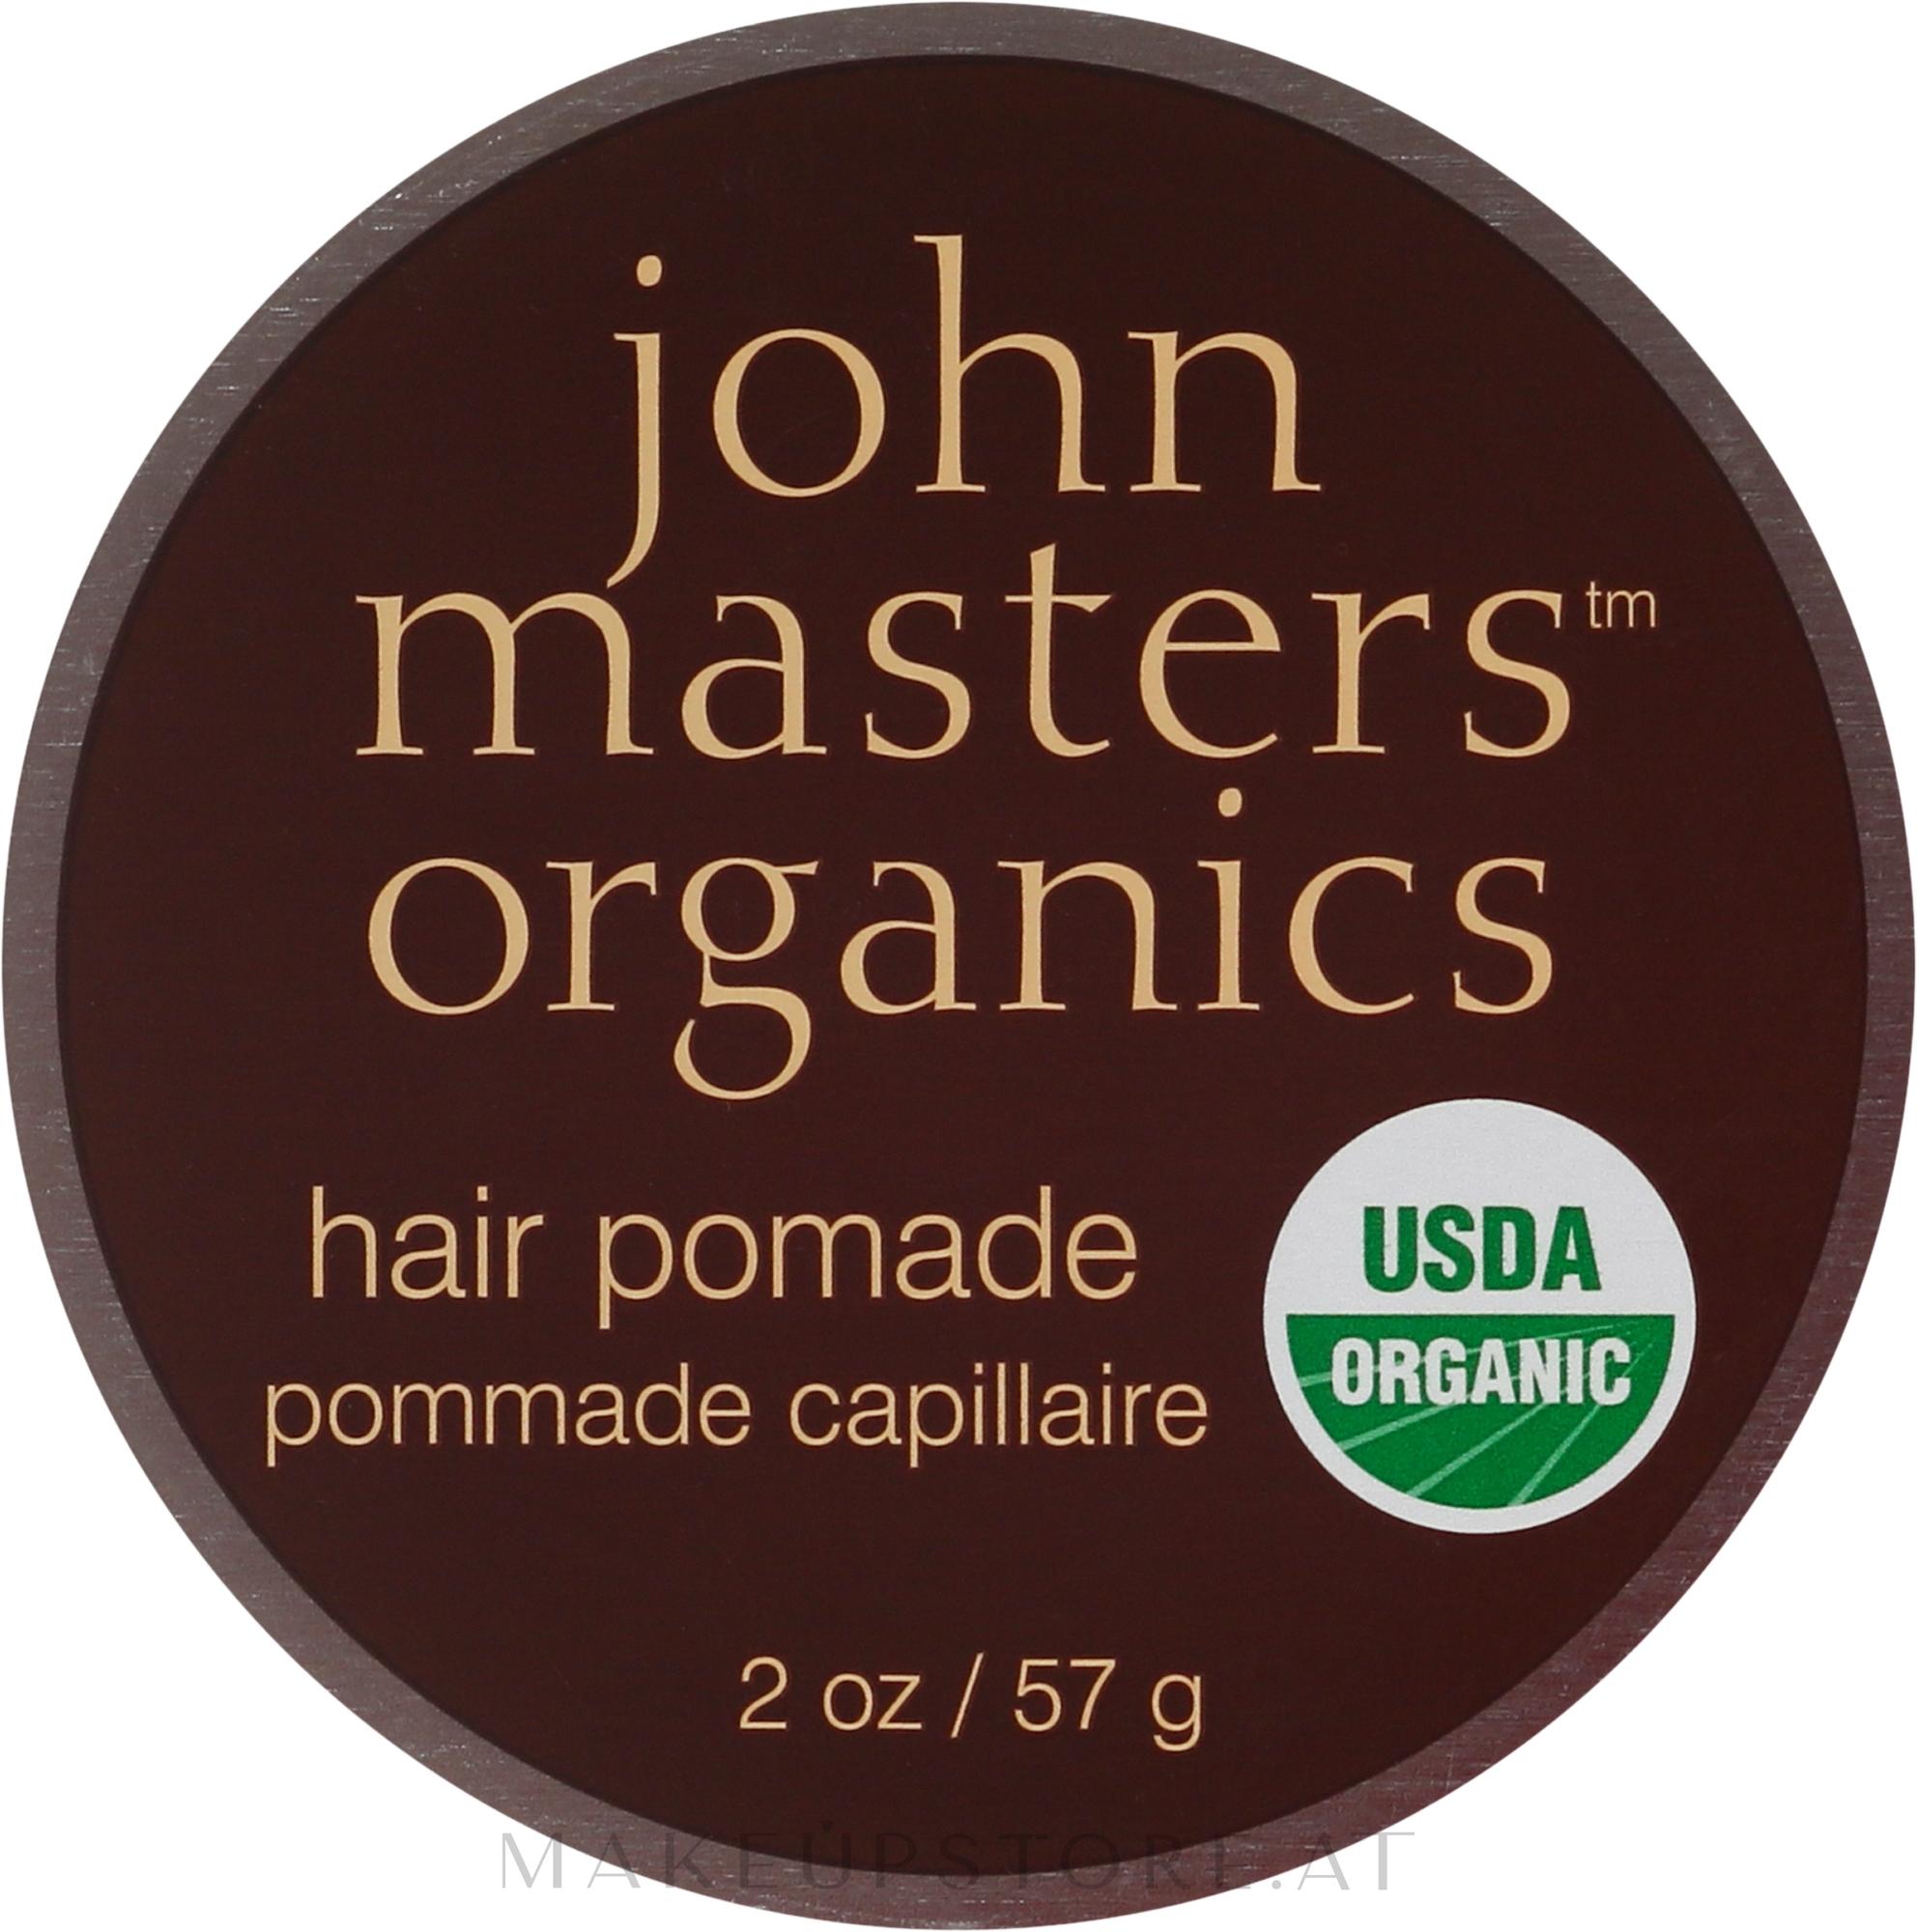 Anti-Frizz Haarpomade mit Glanz-Effekt - John Masters Organics Hair Pomade — Bild 57 g